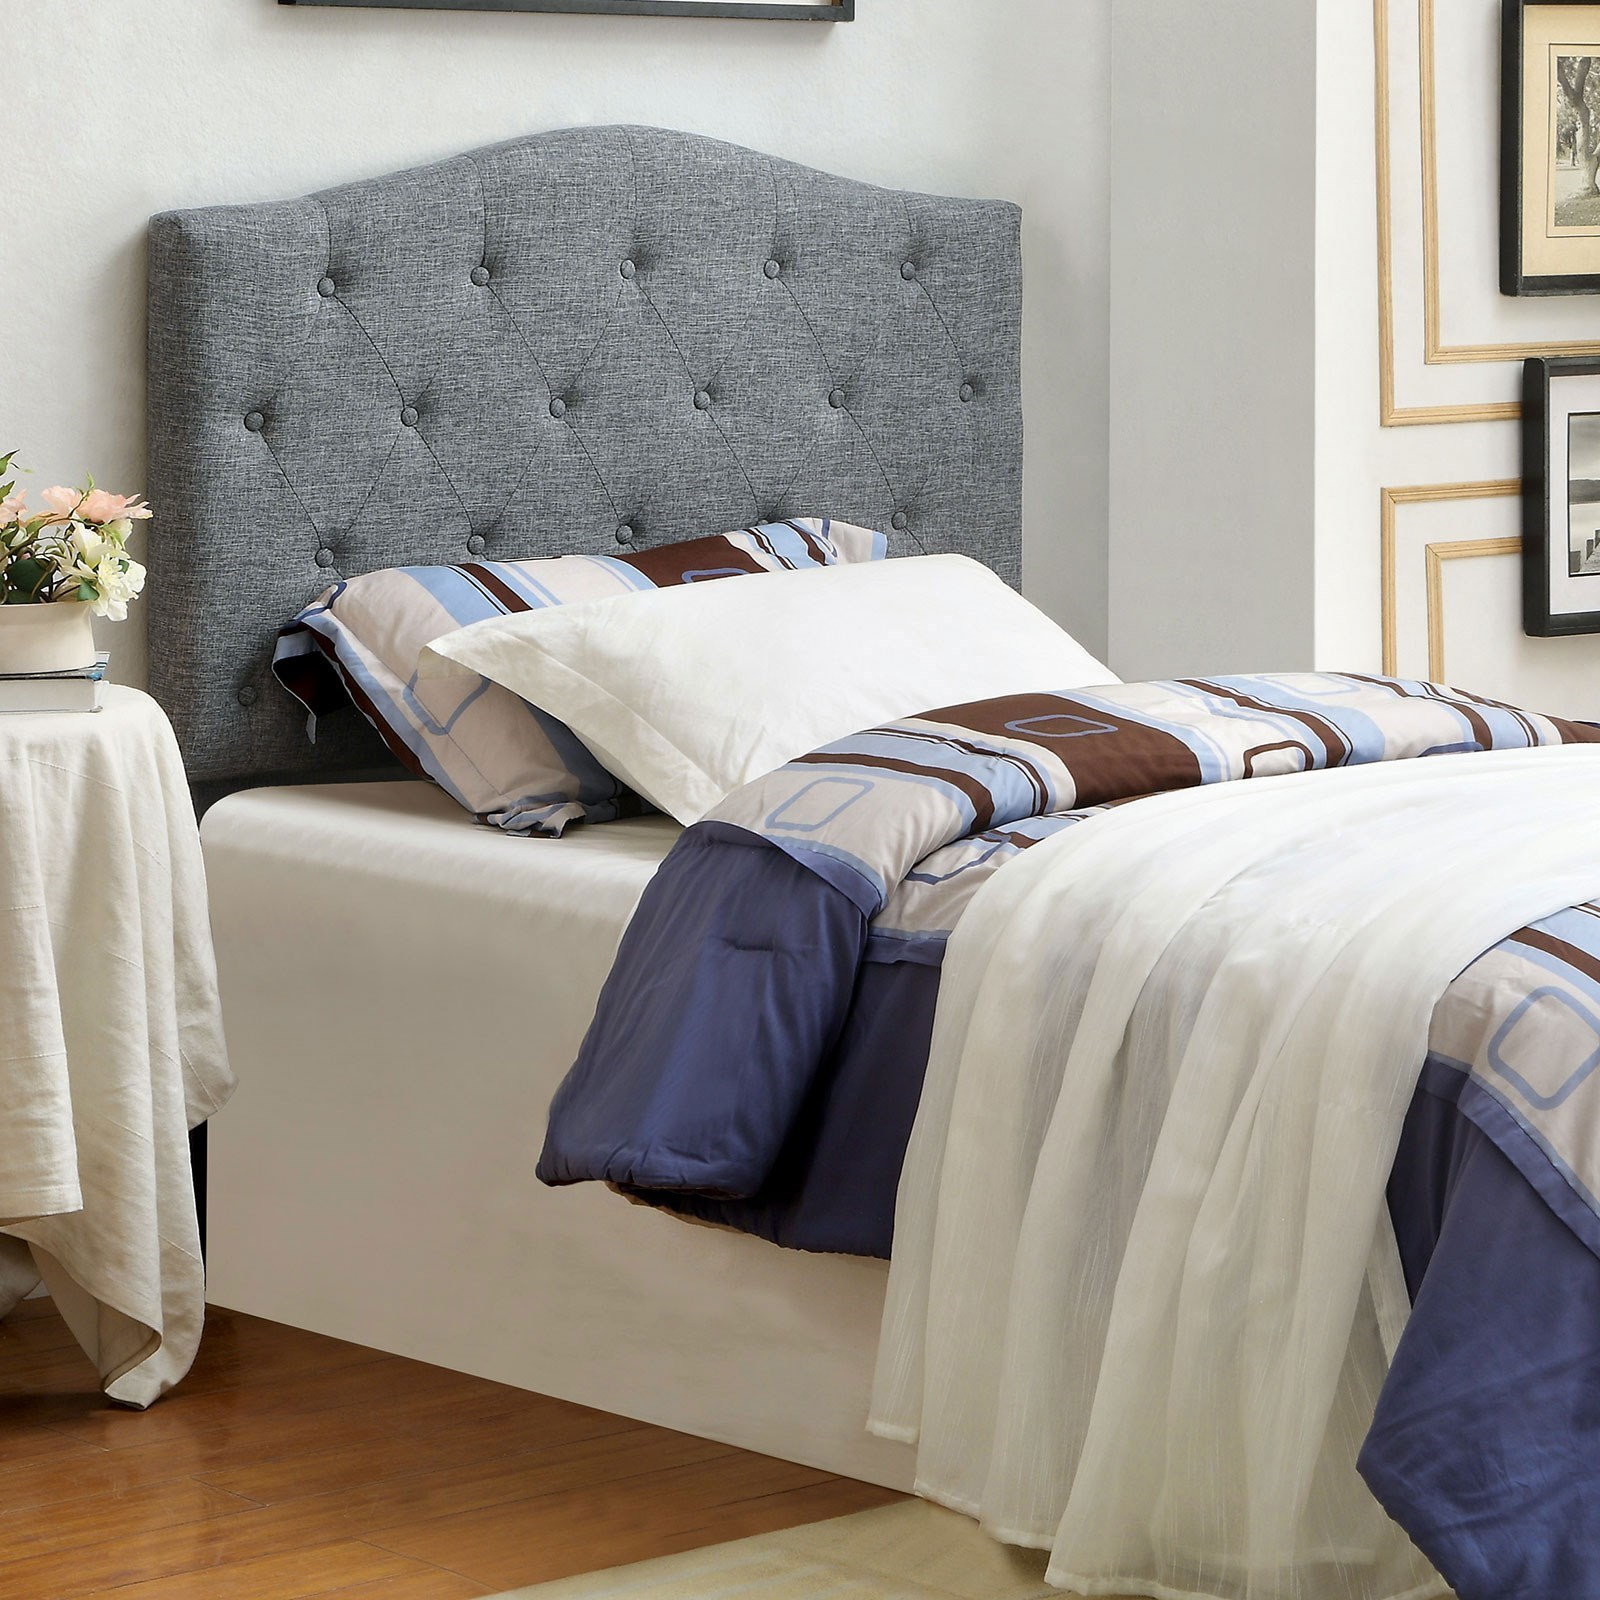 Alipaz Twin Headboard at Household Furniture